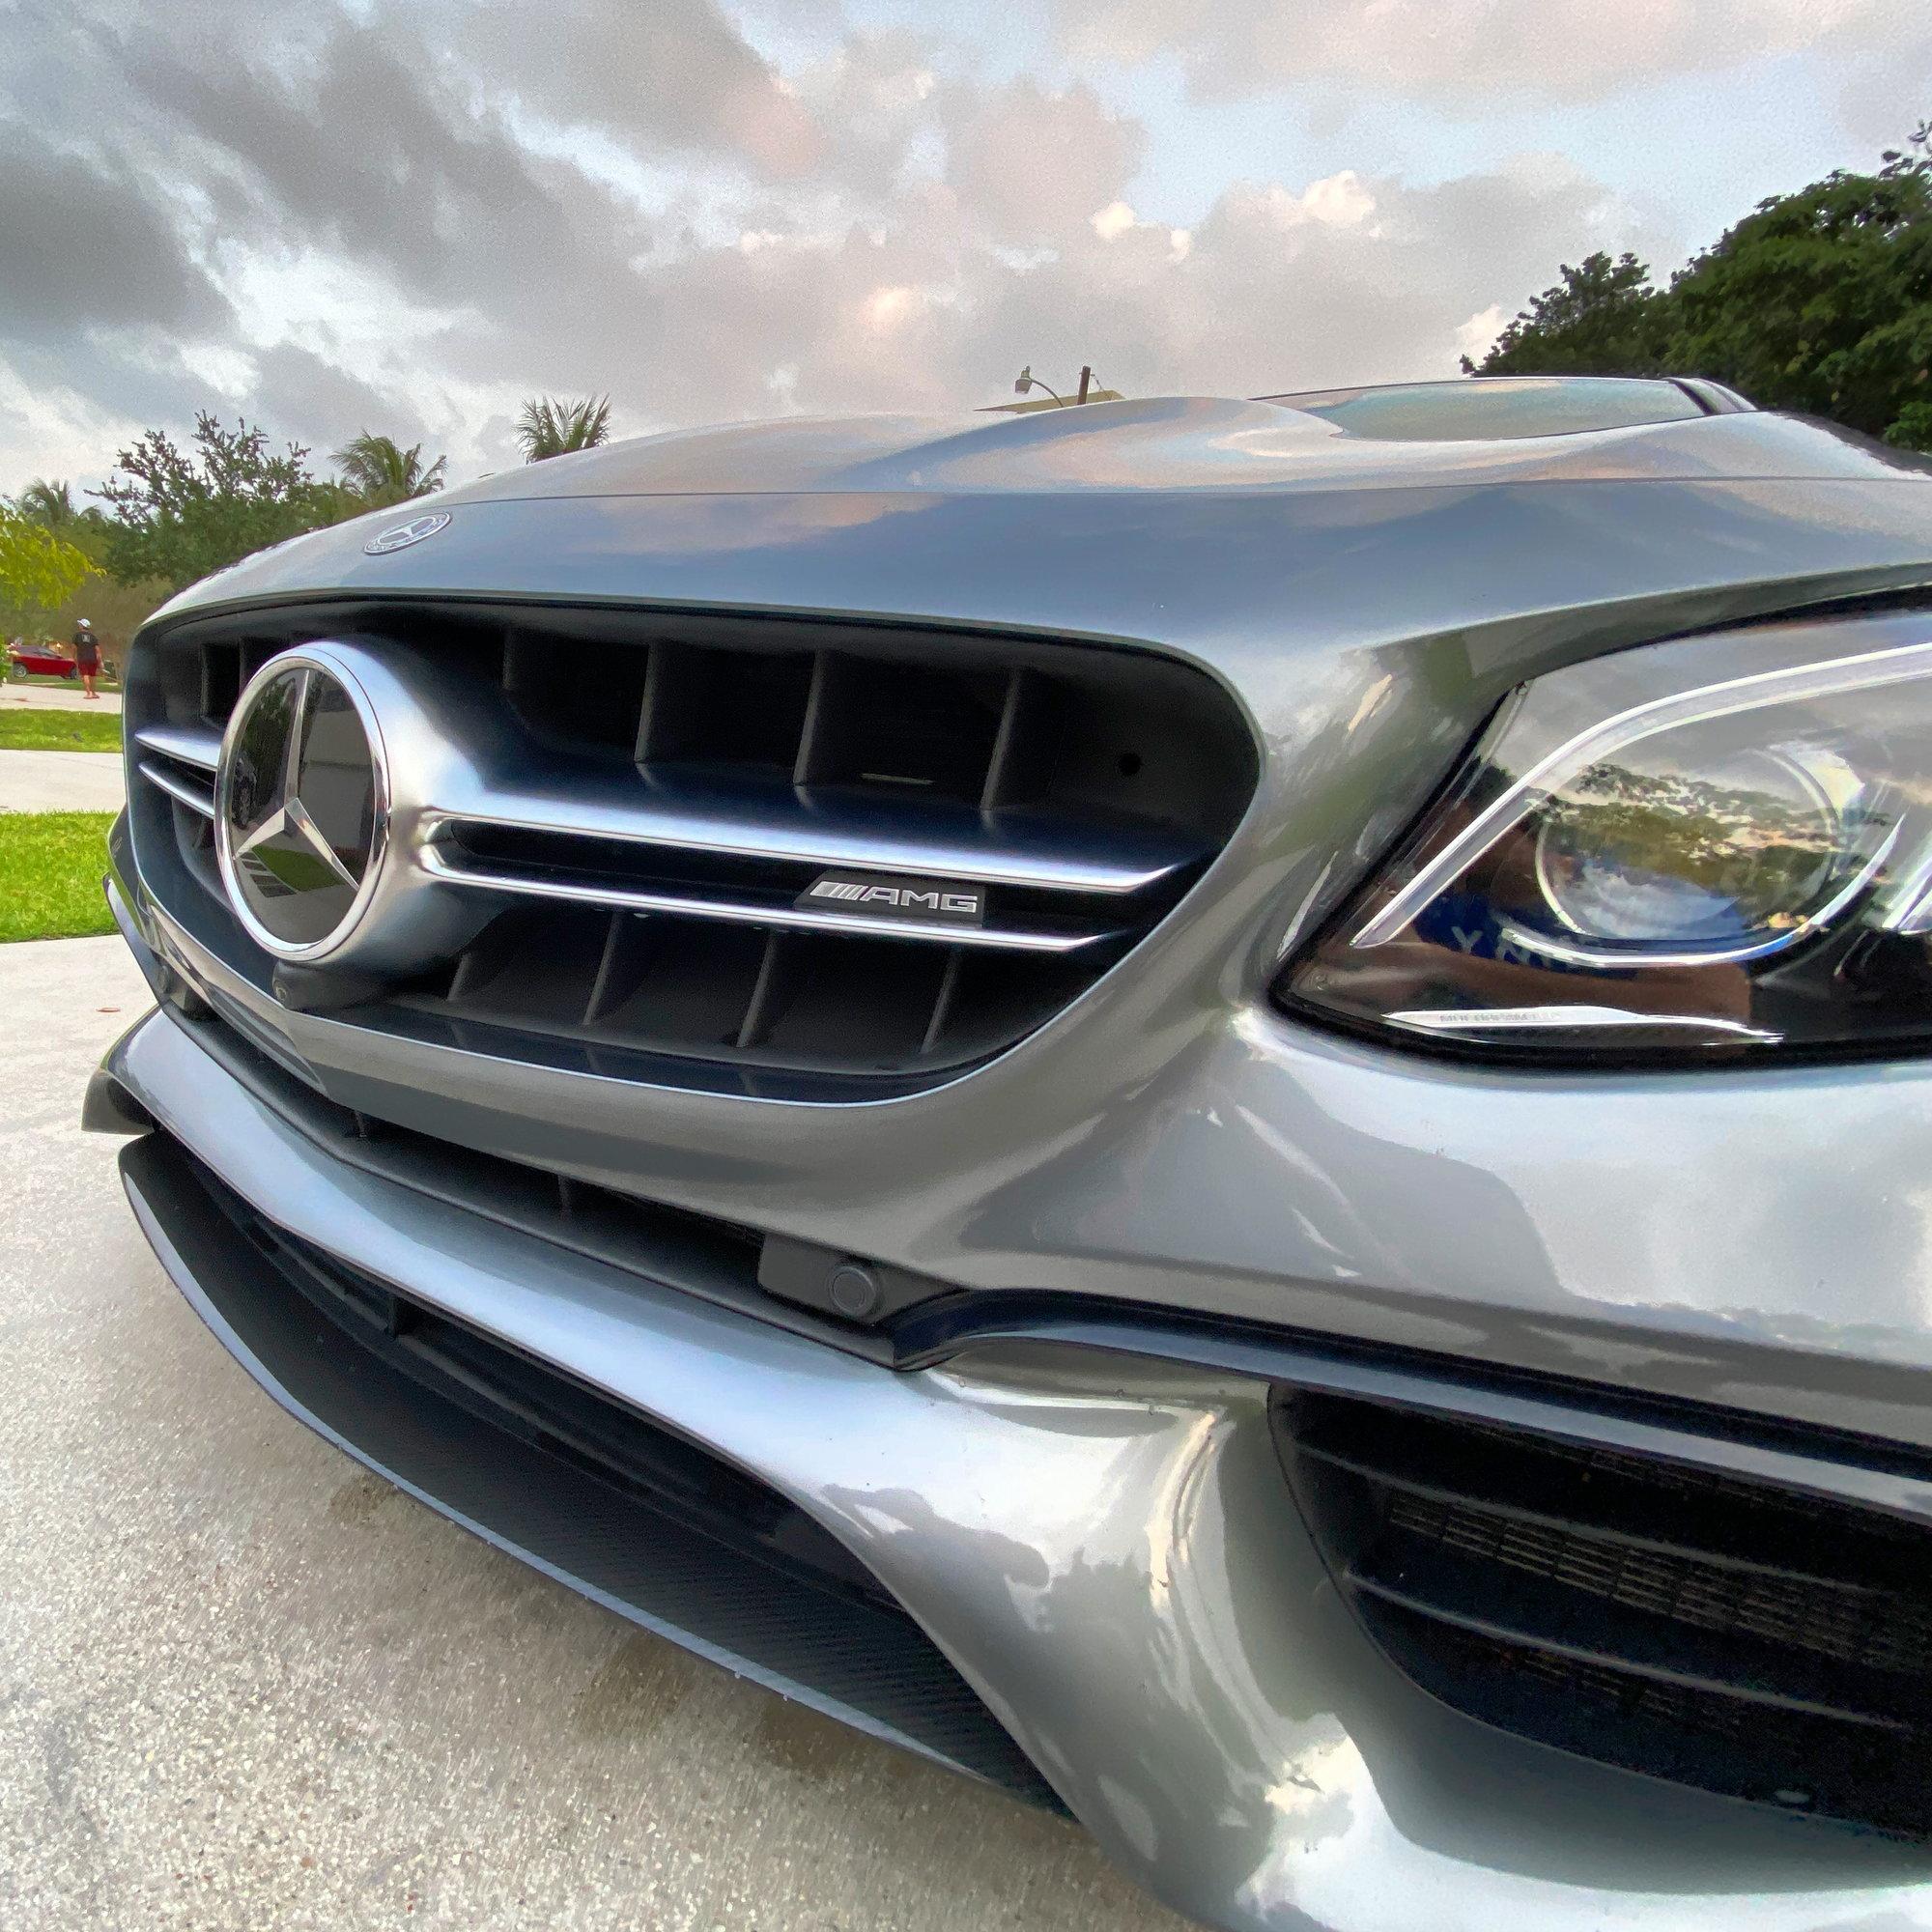 2018 Mercedes Amg E 63 S 4matic Sedan White Road: FS: 2018 Mercedes-Benz E 63 AMG S 4MATIC Sedan